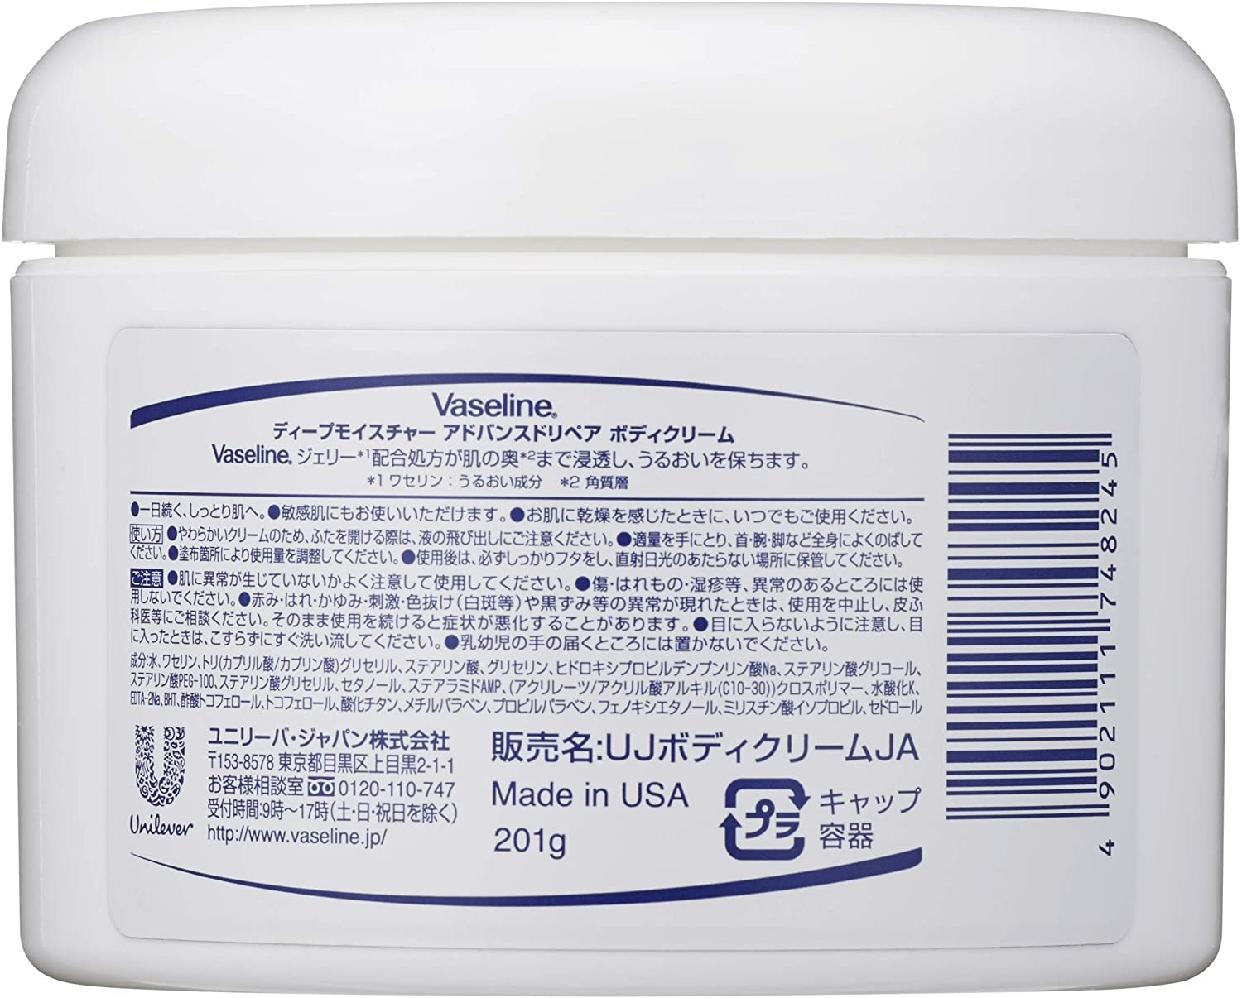 Vaseline(ヴァセリン)アドバンスドリペアボディクリームの商品画像3